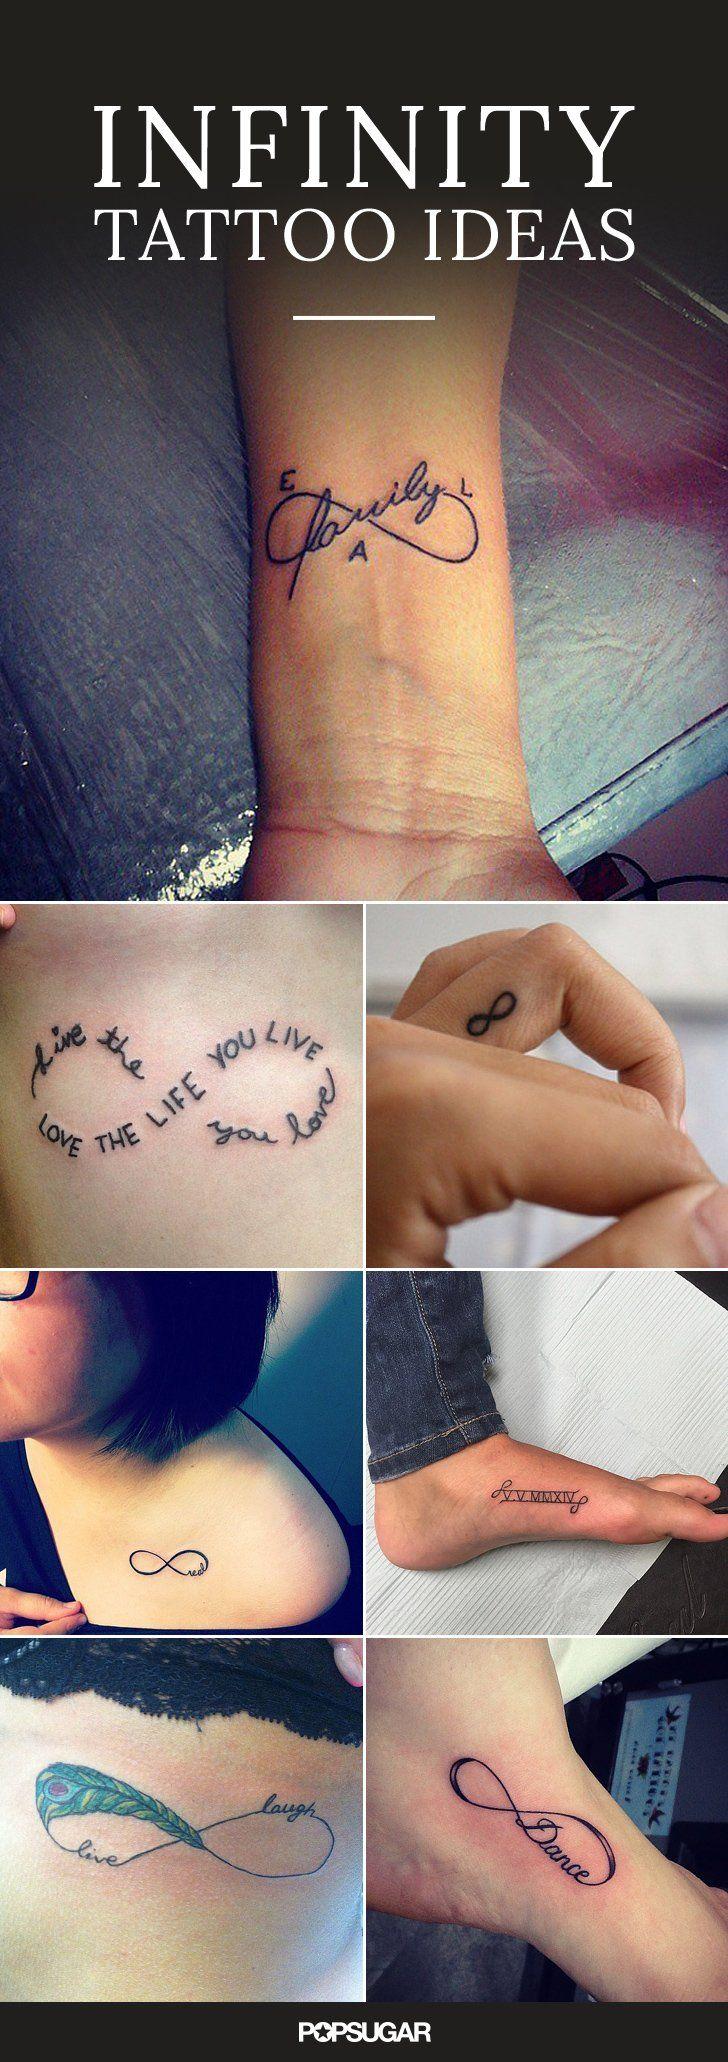 21 infinity sign tattoos you won t regret getting. Black Bedroom Furniture Sets. Home Design Ideas